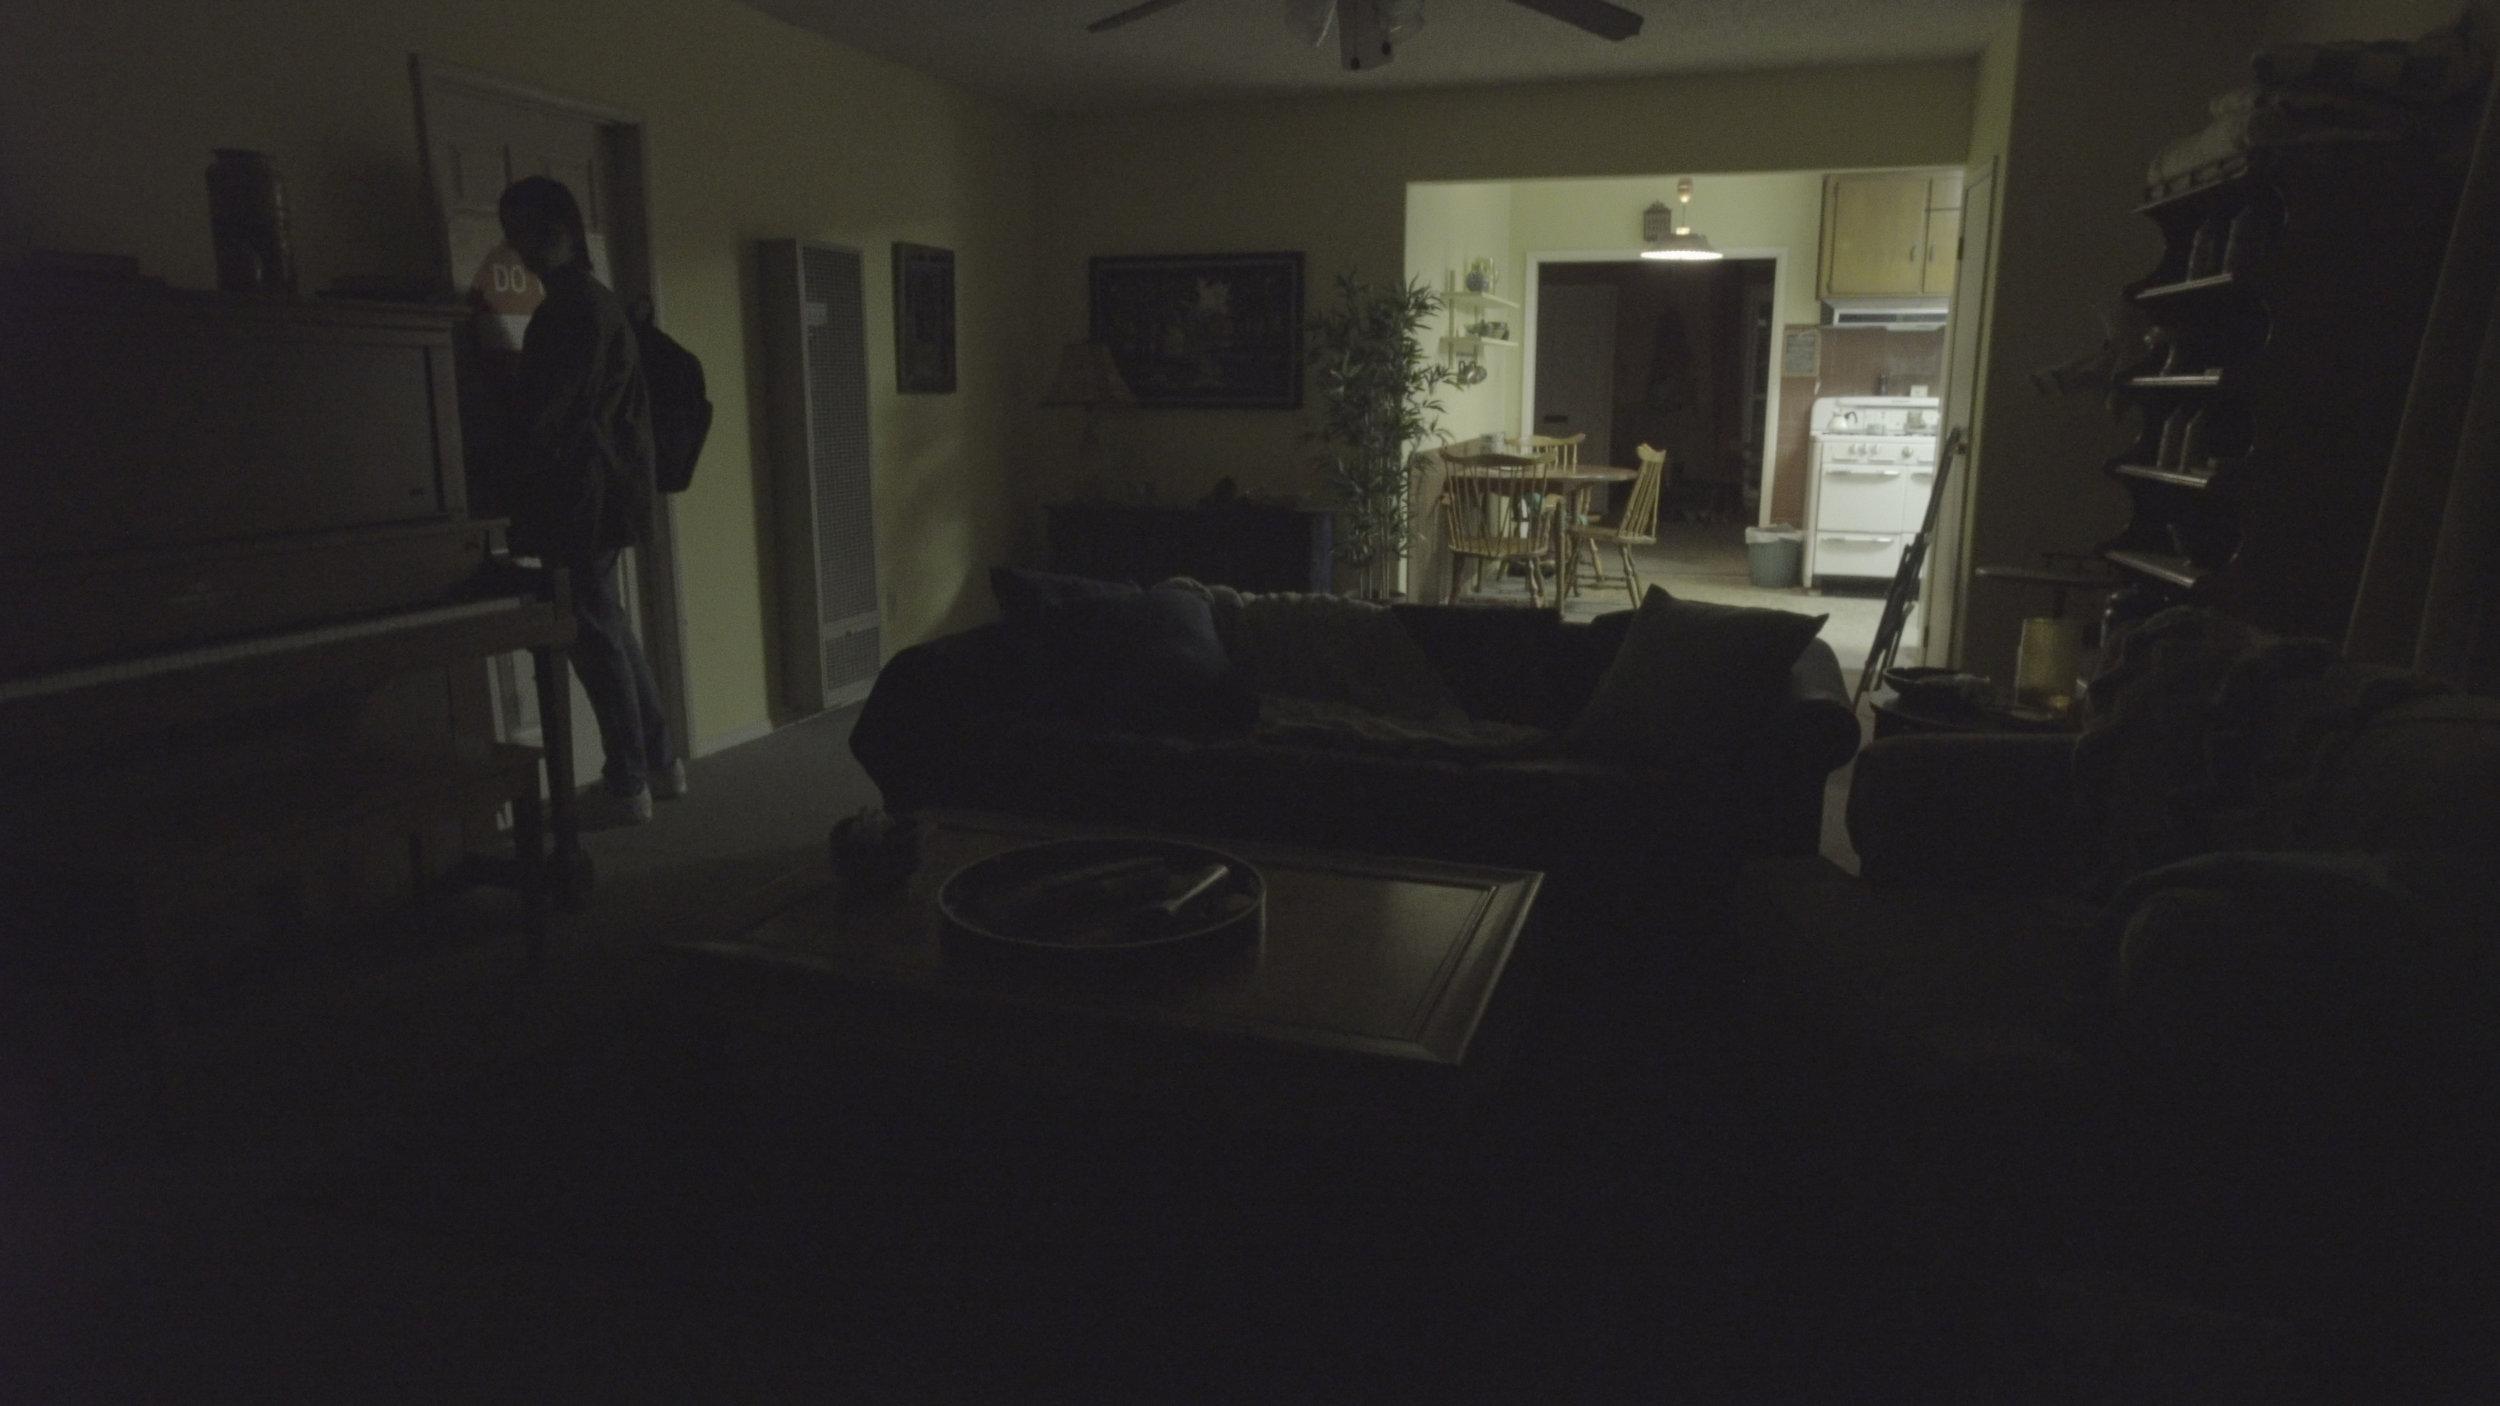 Jacob isn't afraid of the dark